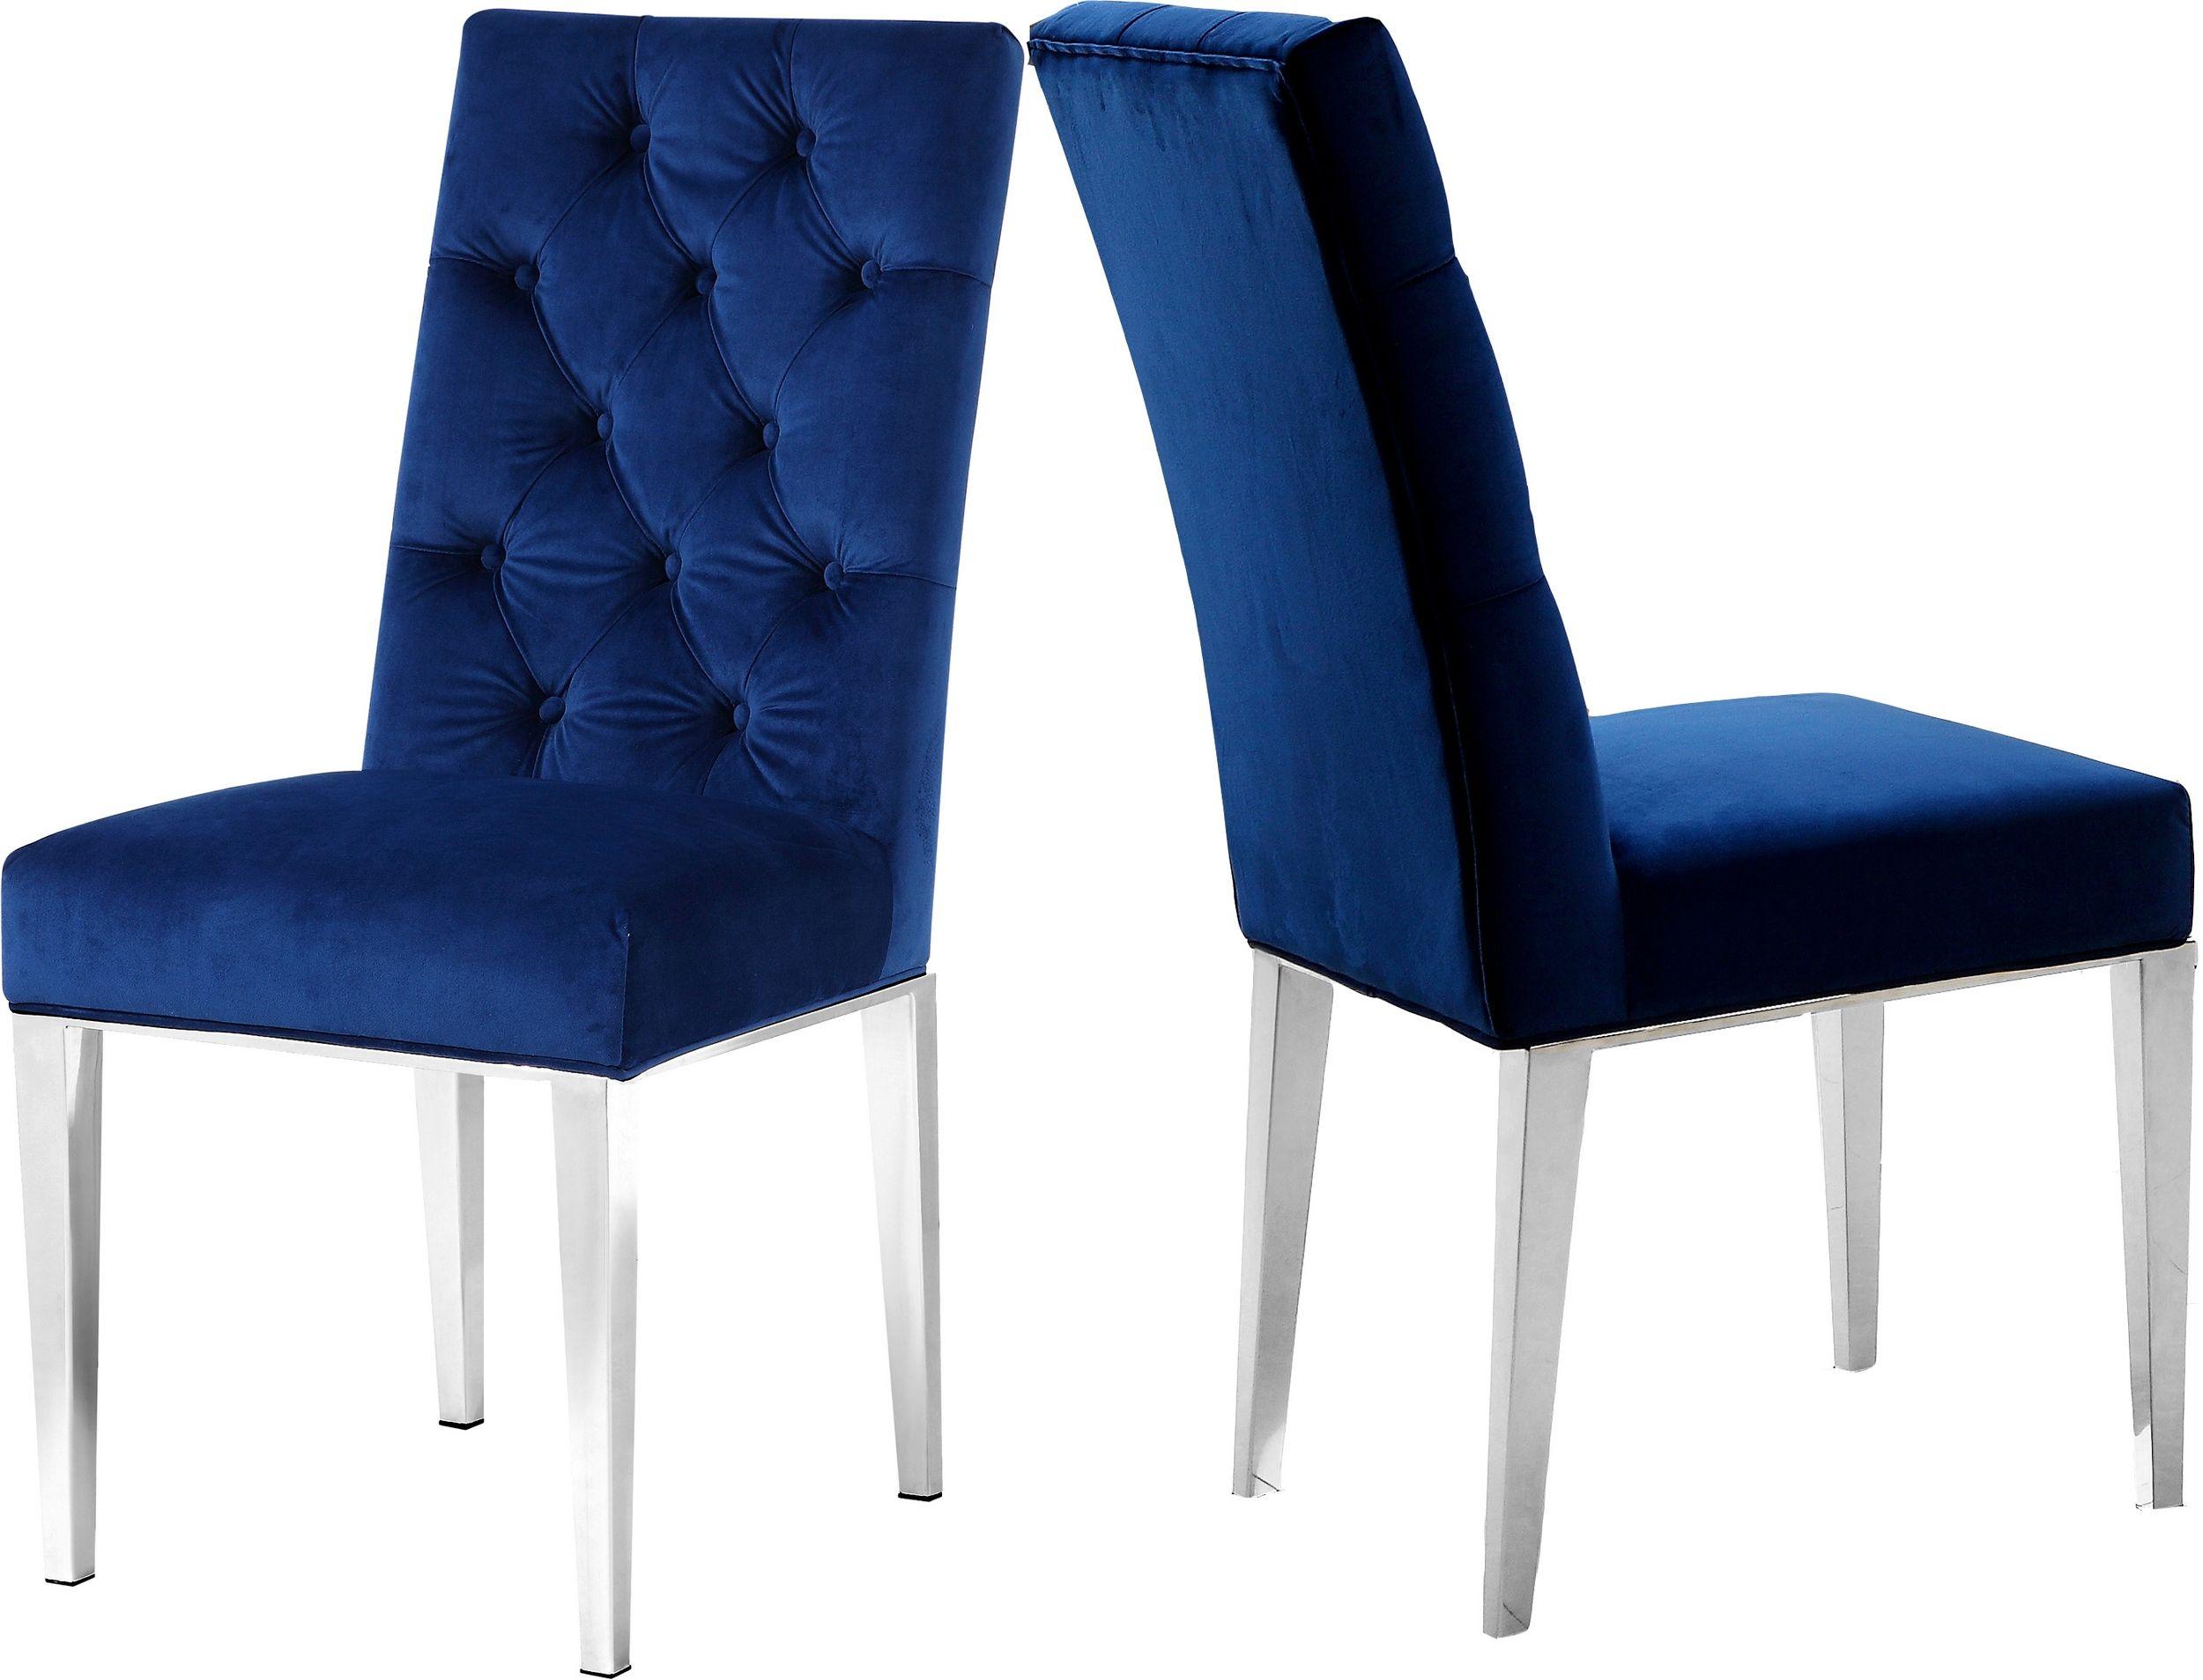 Lowest Price On Meridian Juno Navy Velvet Dining Chair Set Of 2 732navy C Shop Today Velvet Dining Chairs Dining Chair Upholstery Dining Chairs